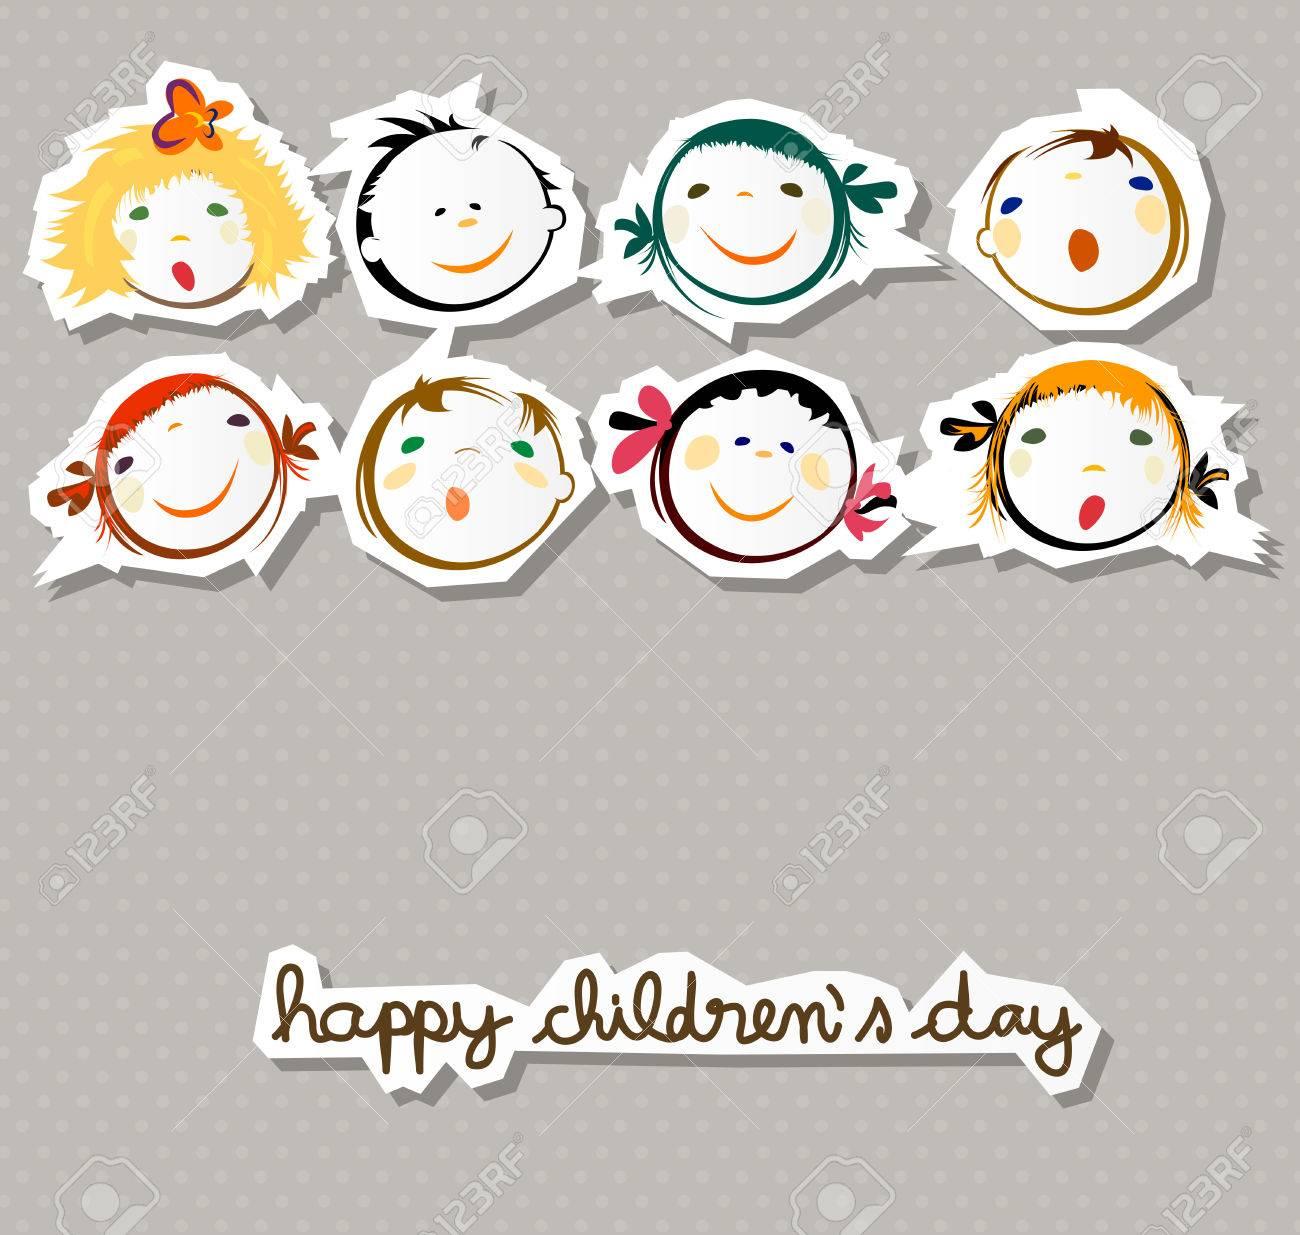 happy childrens day - 39854228